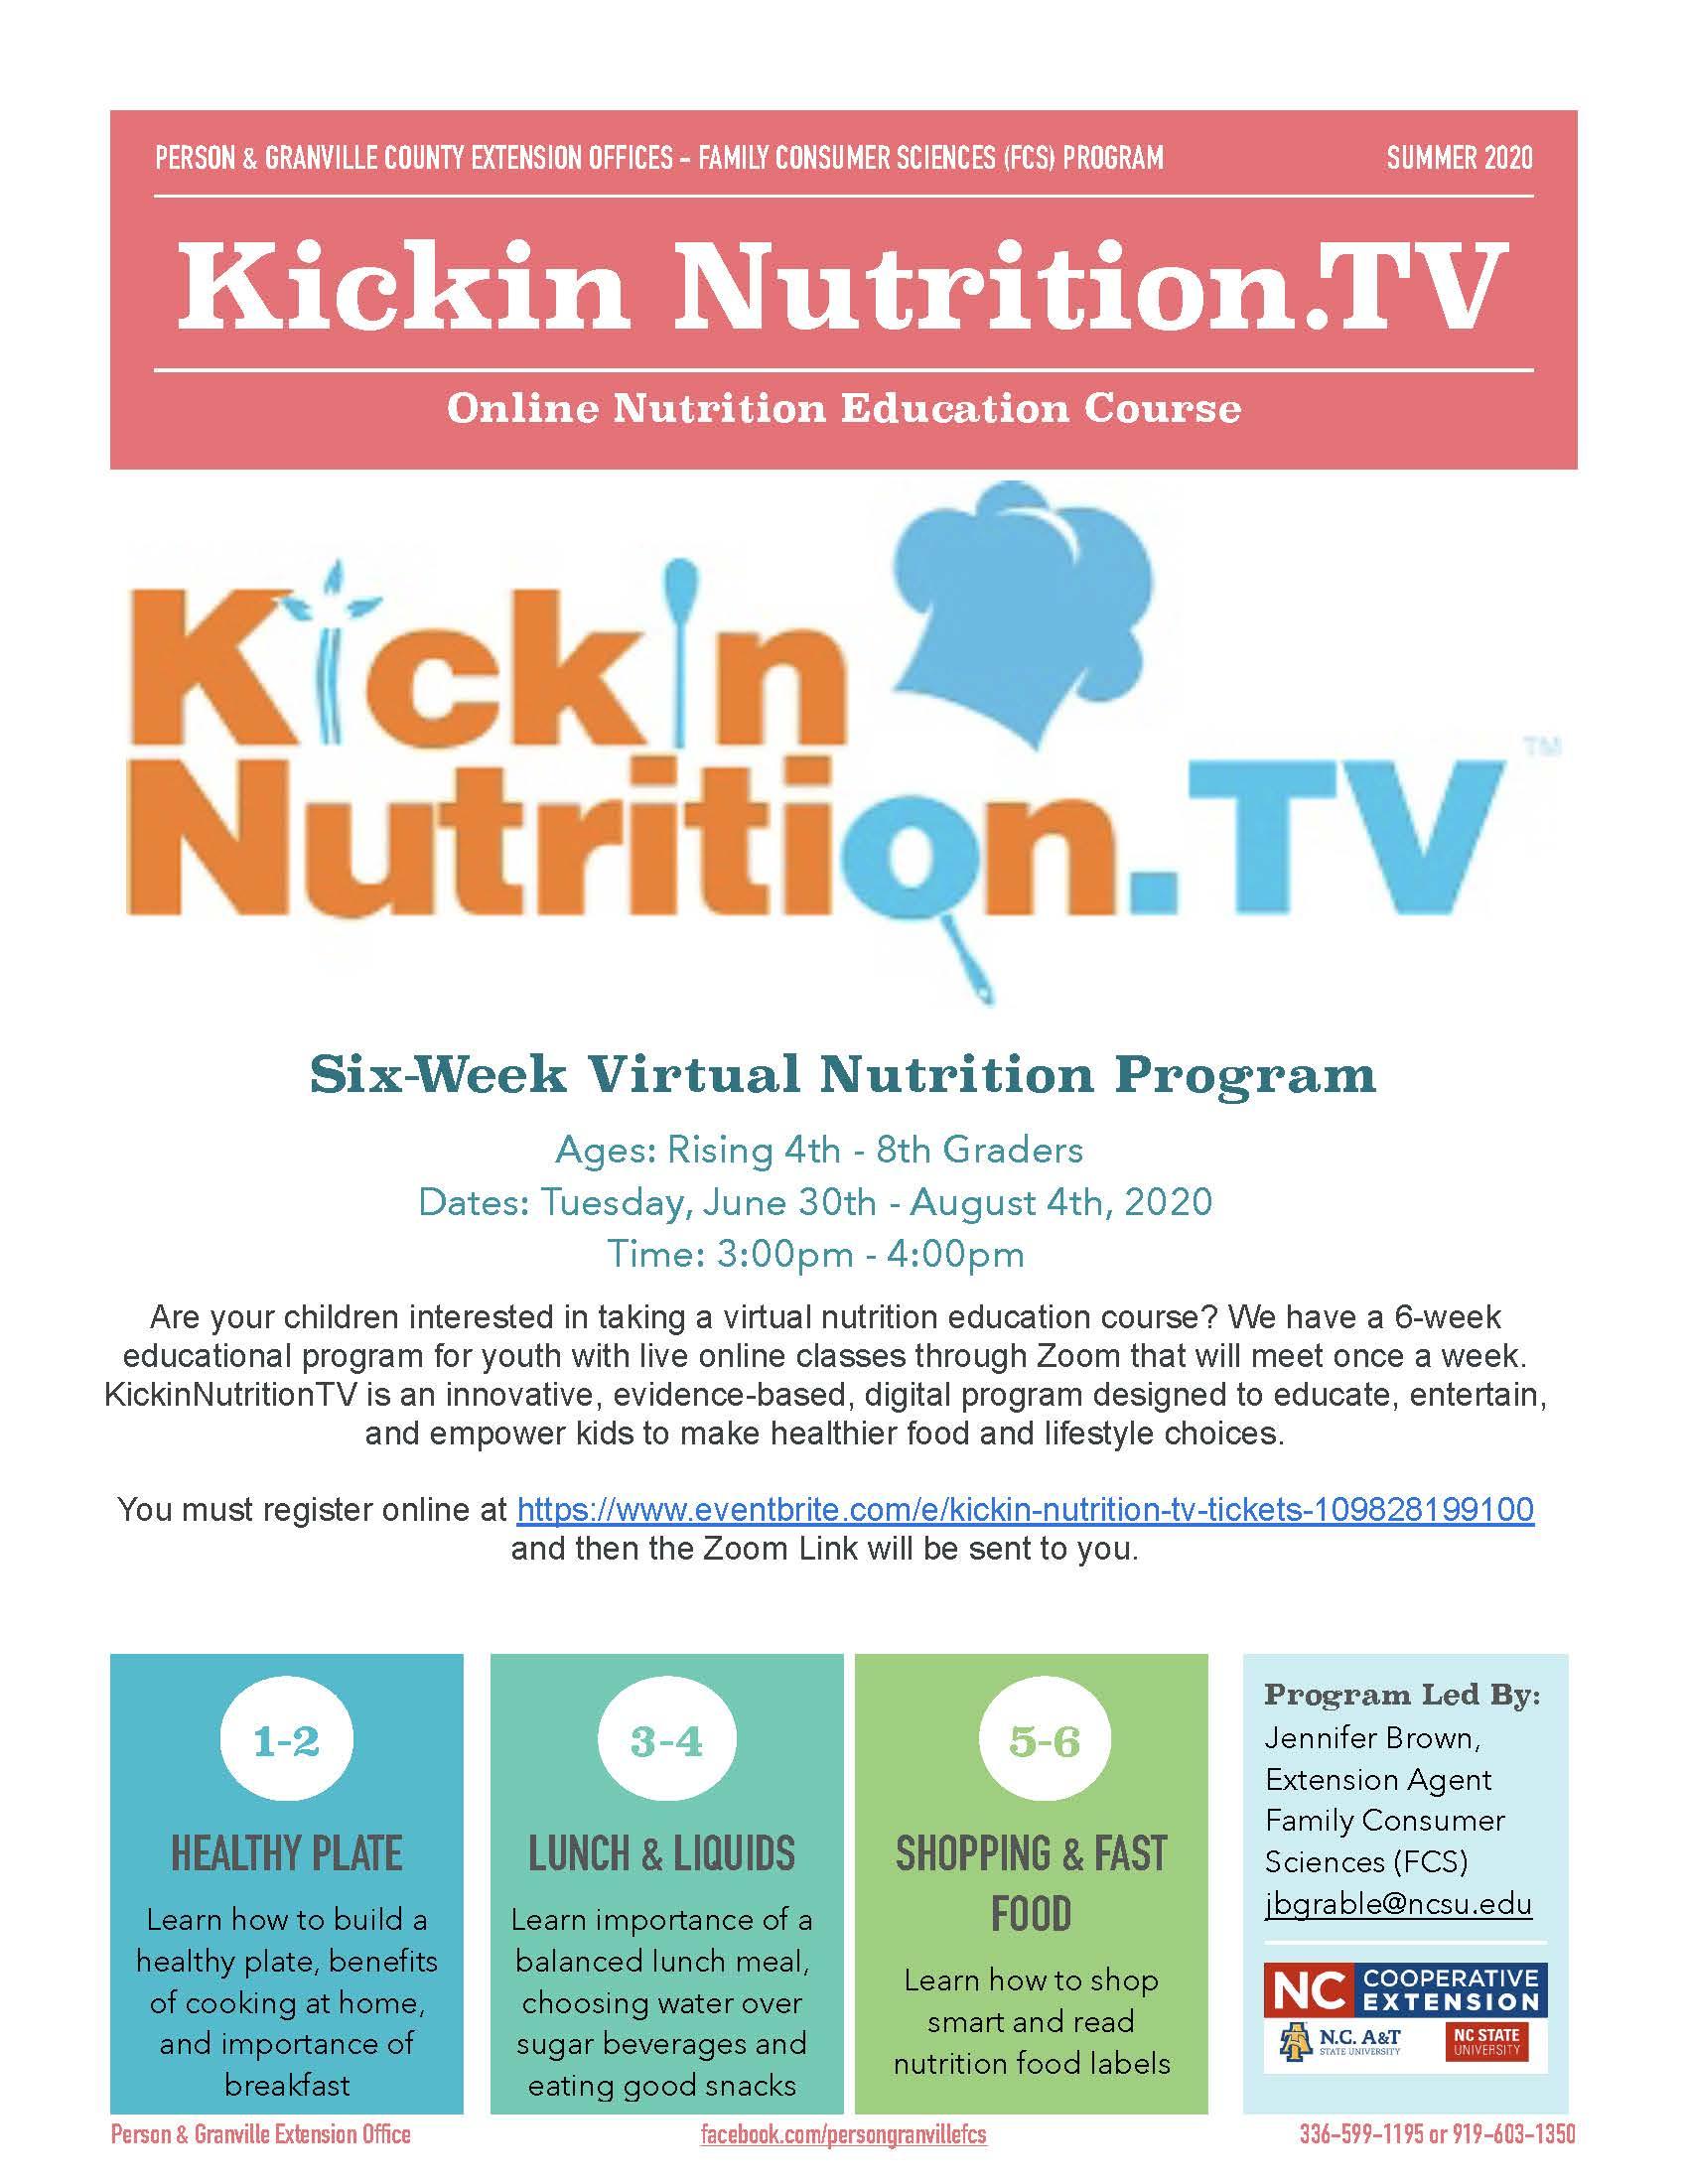 Kickin Nutrition TV